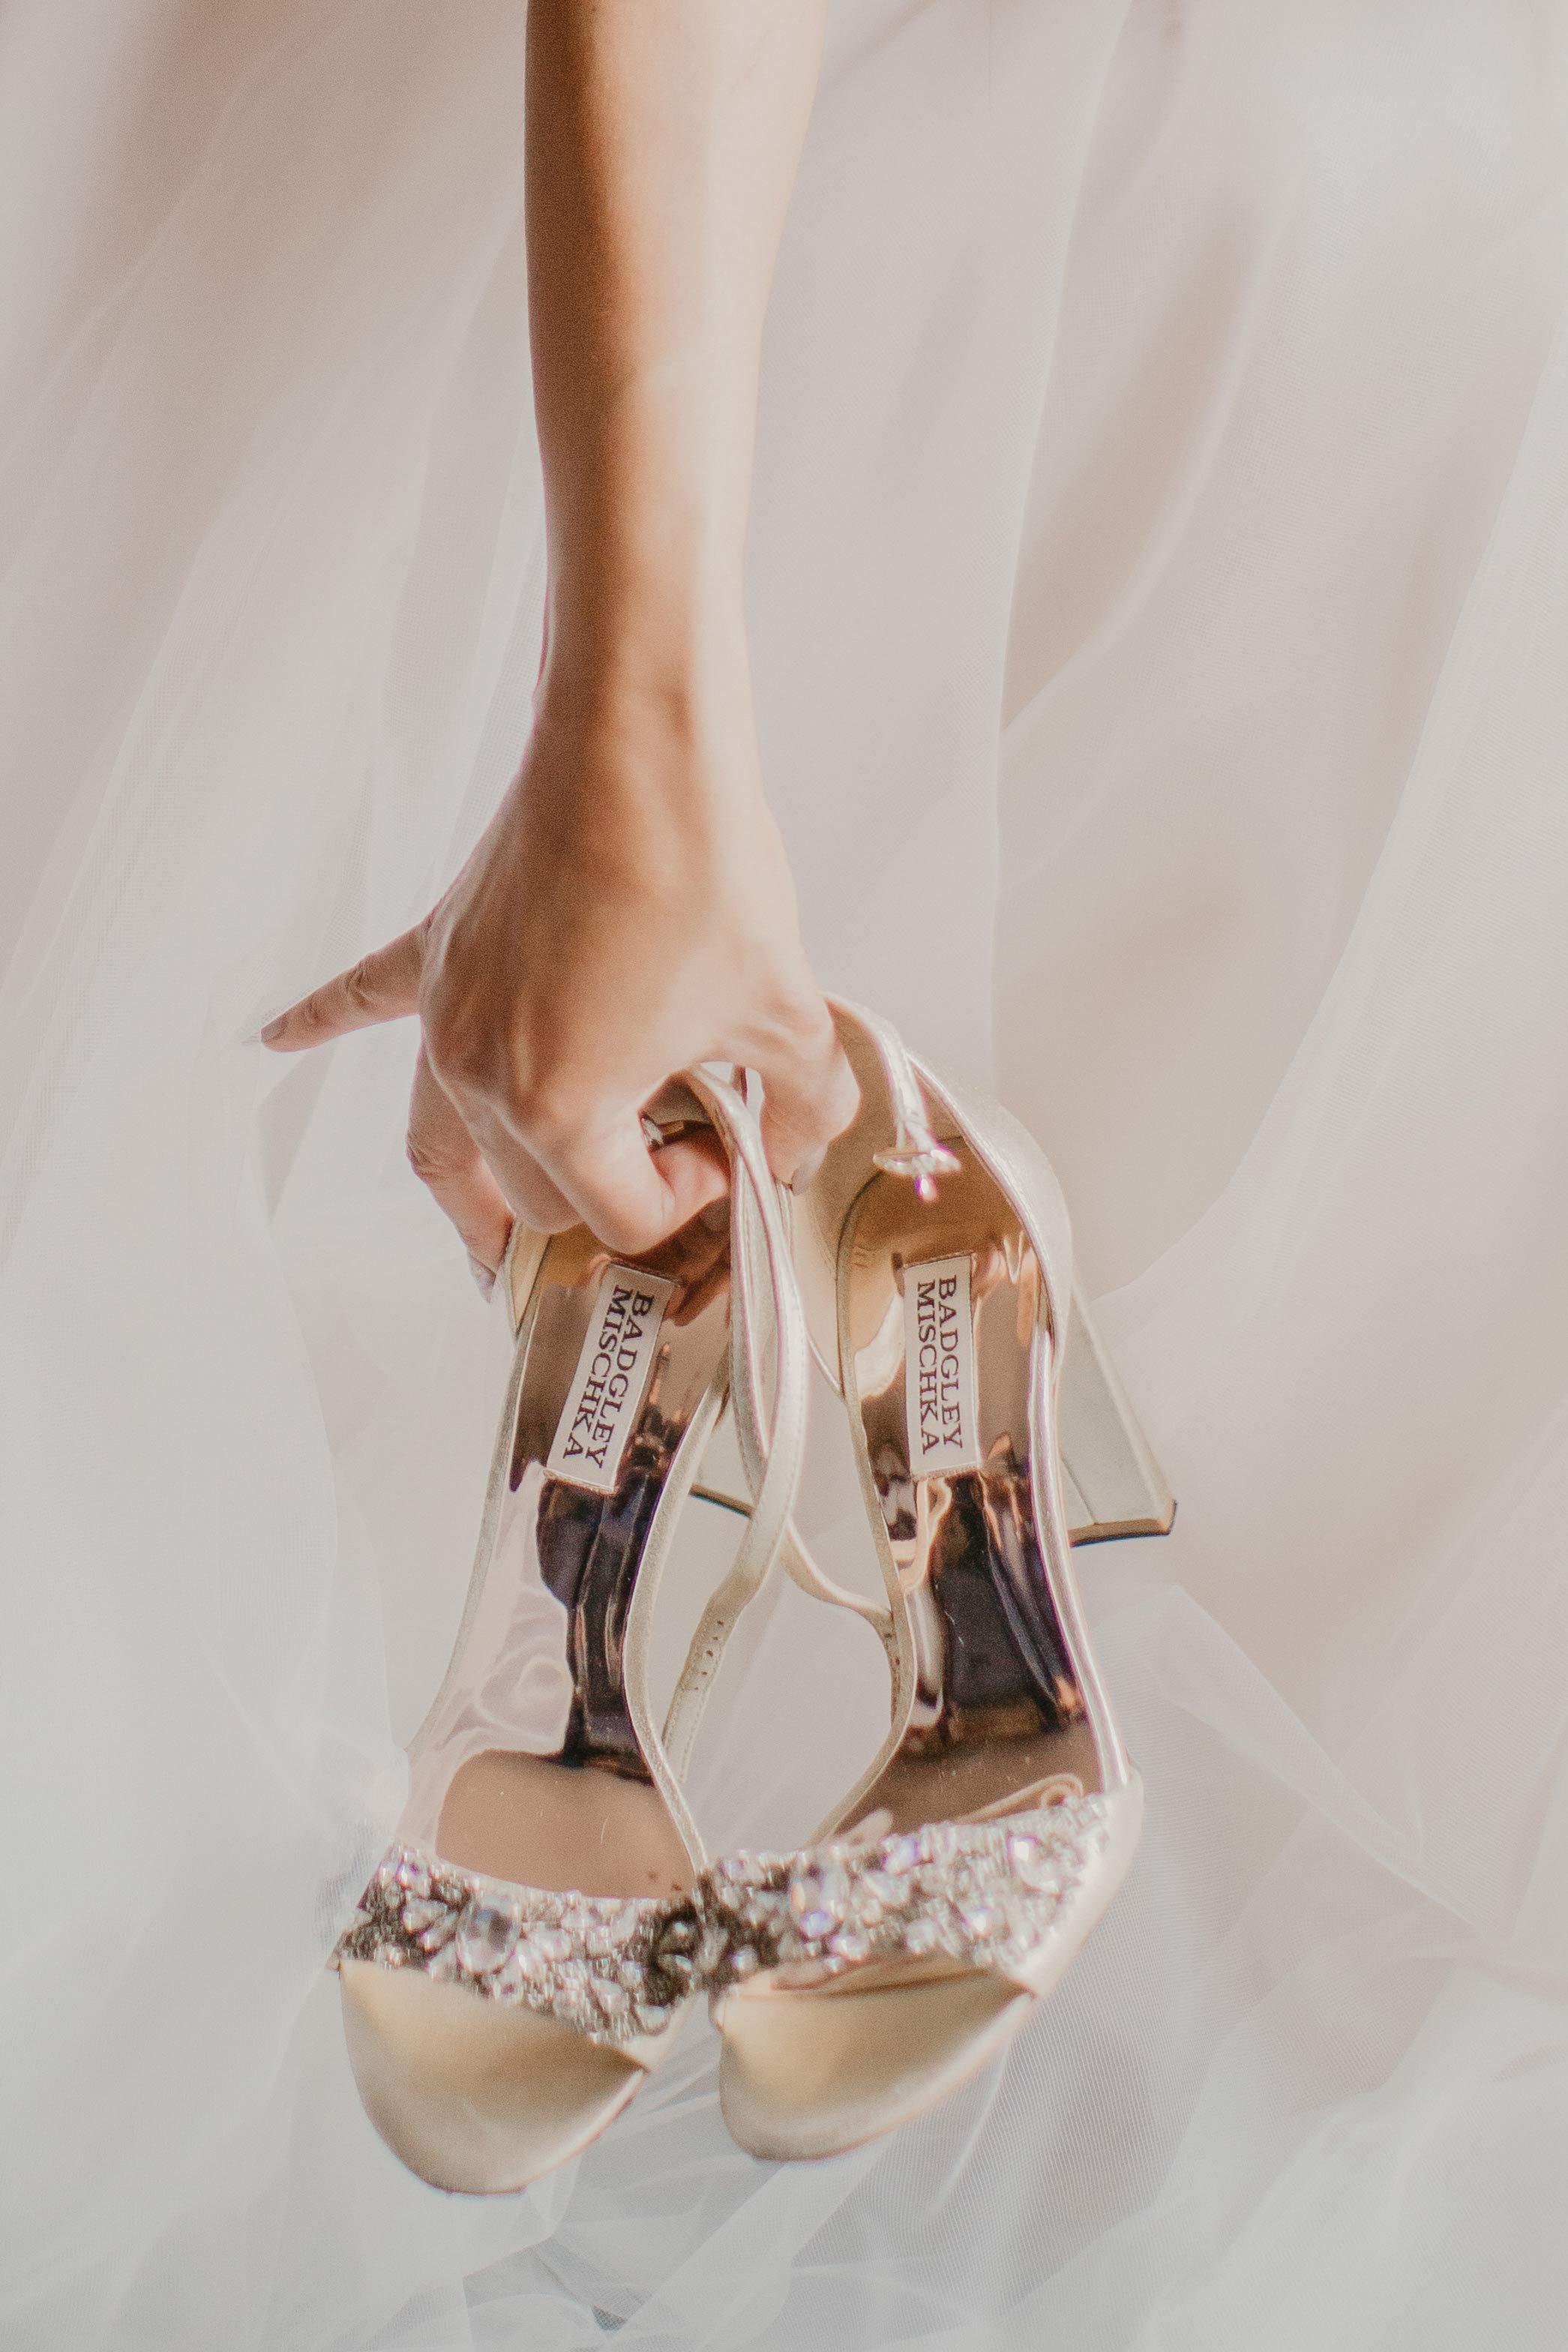 www.santabarbarawedding.com | Candice Marie Photography | Hilton Santa Barbara Beachfront Resort | Dalina Klan | Once in a Lifetime Weddings | Bride's Shoes